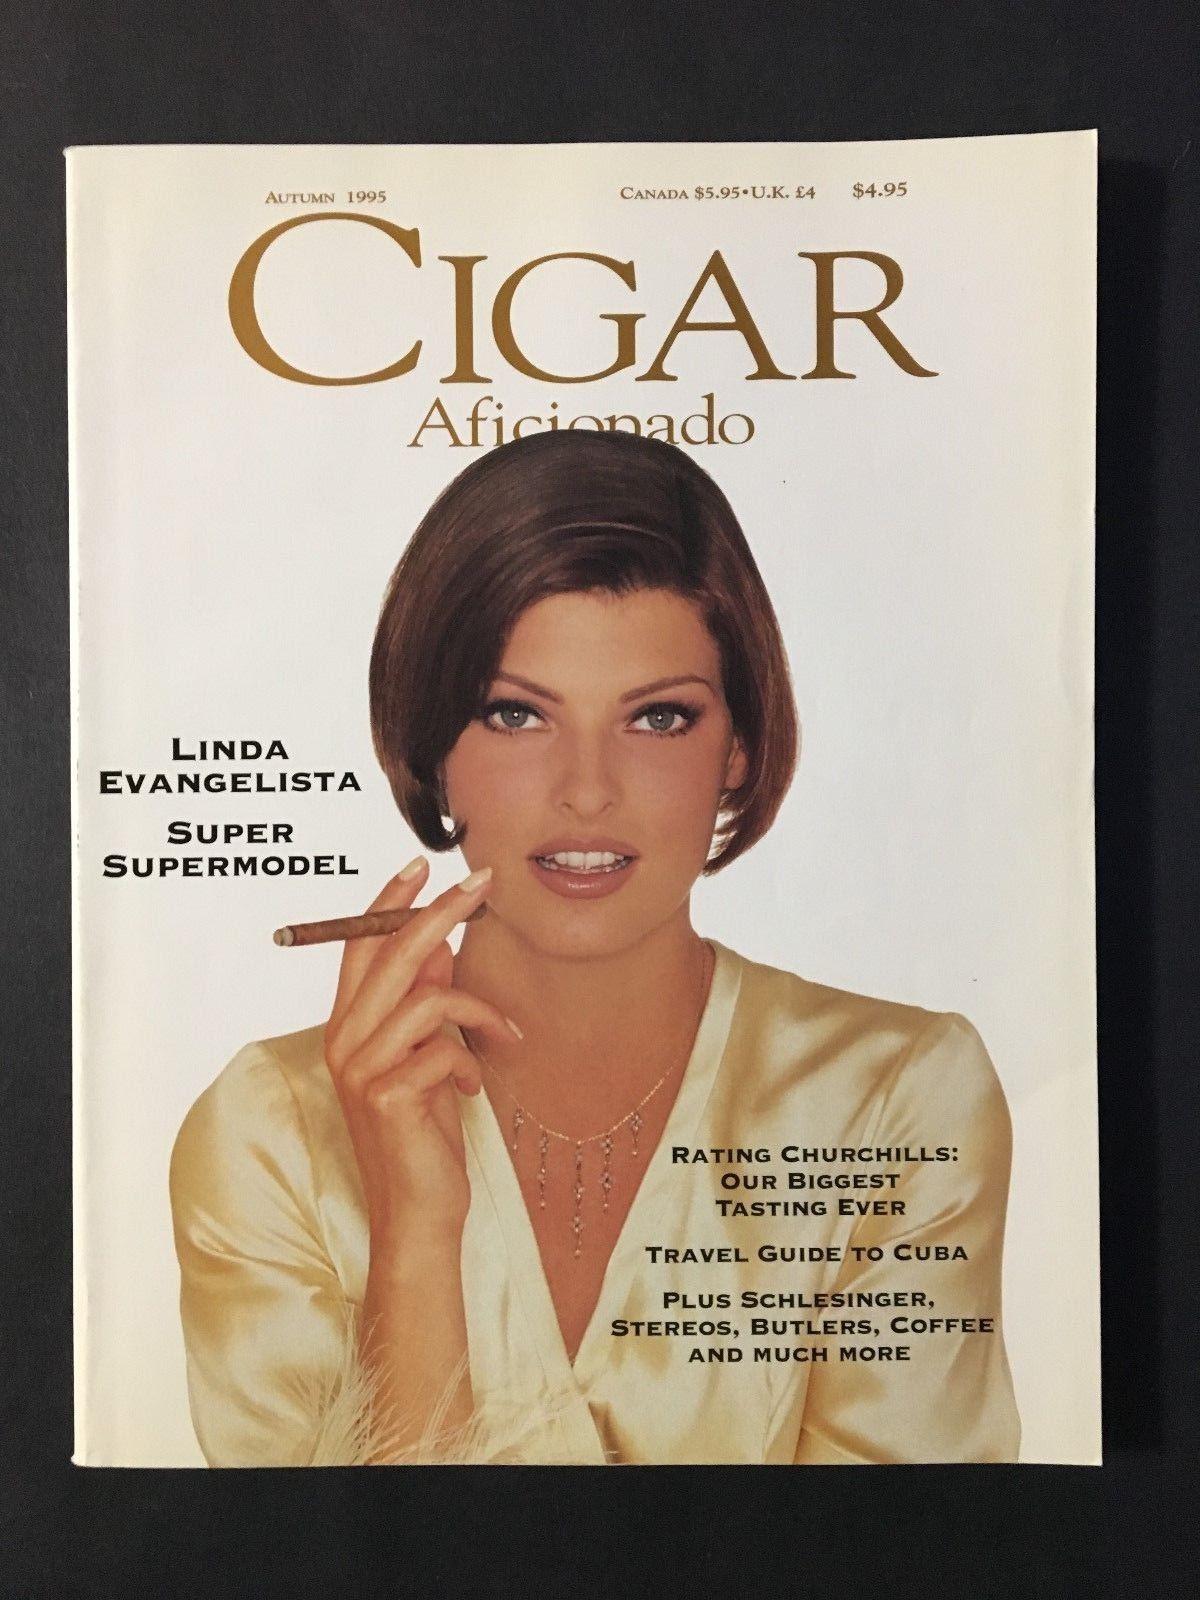 cigar-aficionado-magazine-august-1995-linda-evangelista.jpg